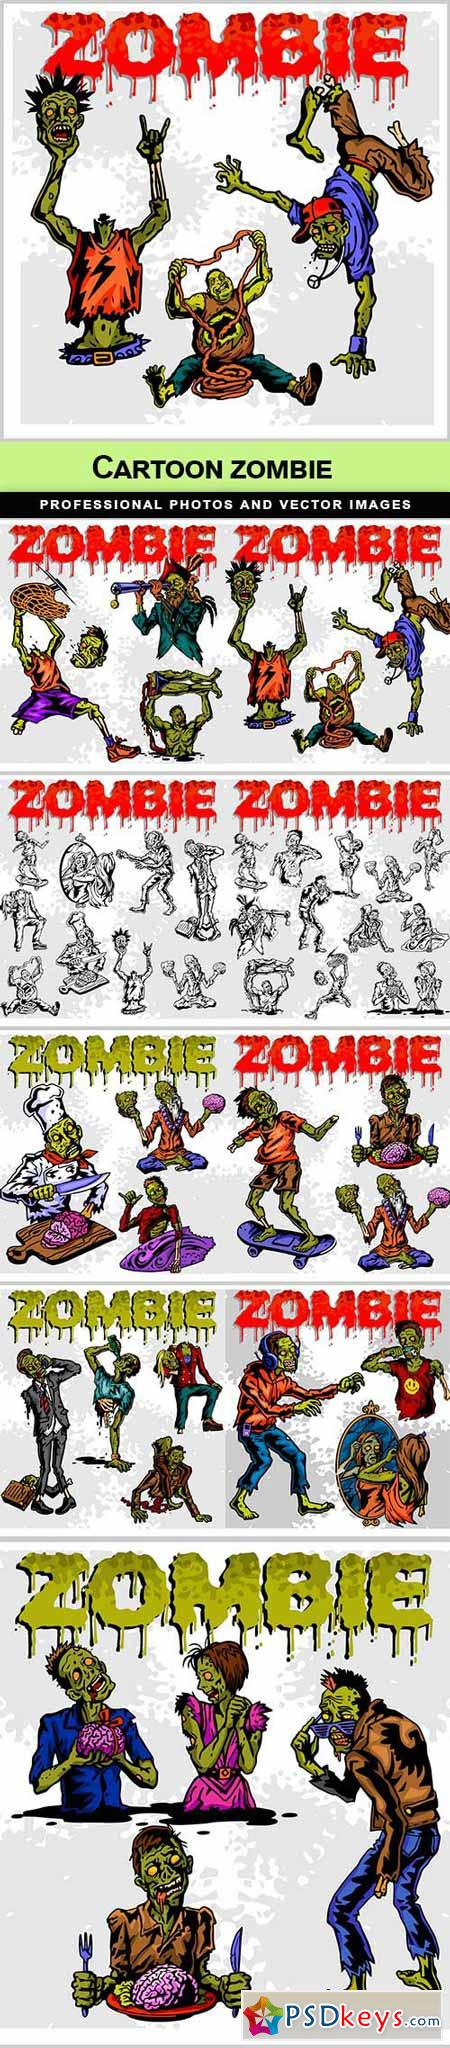 Cartoon zombie - 9 EPS